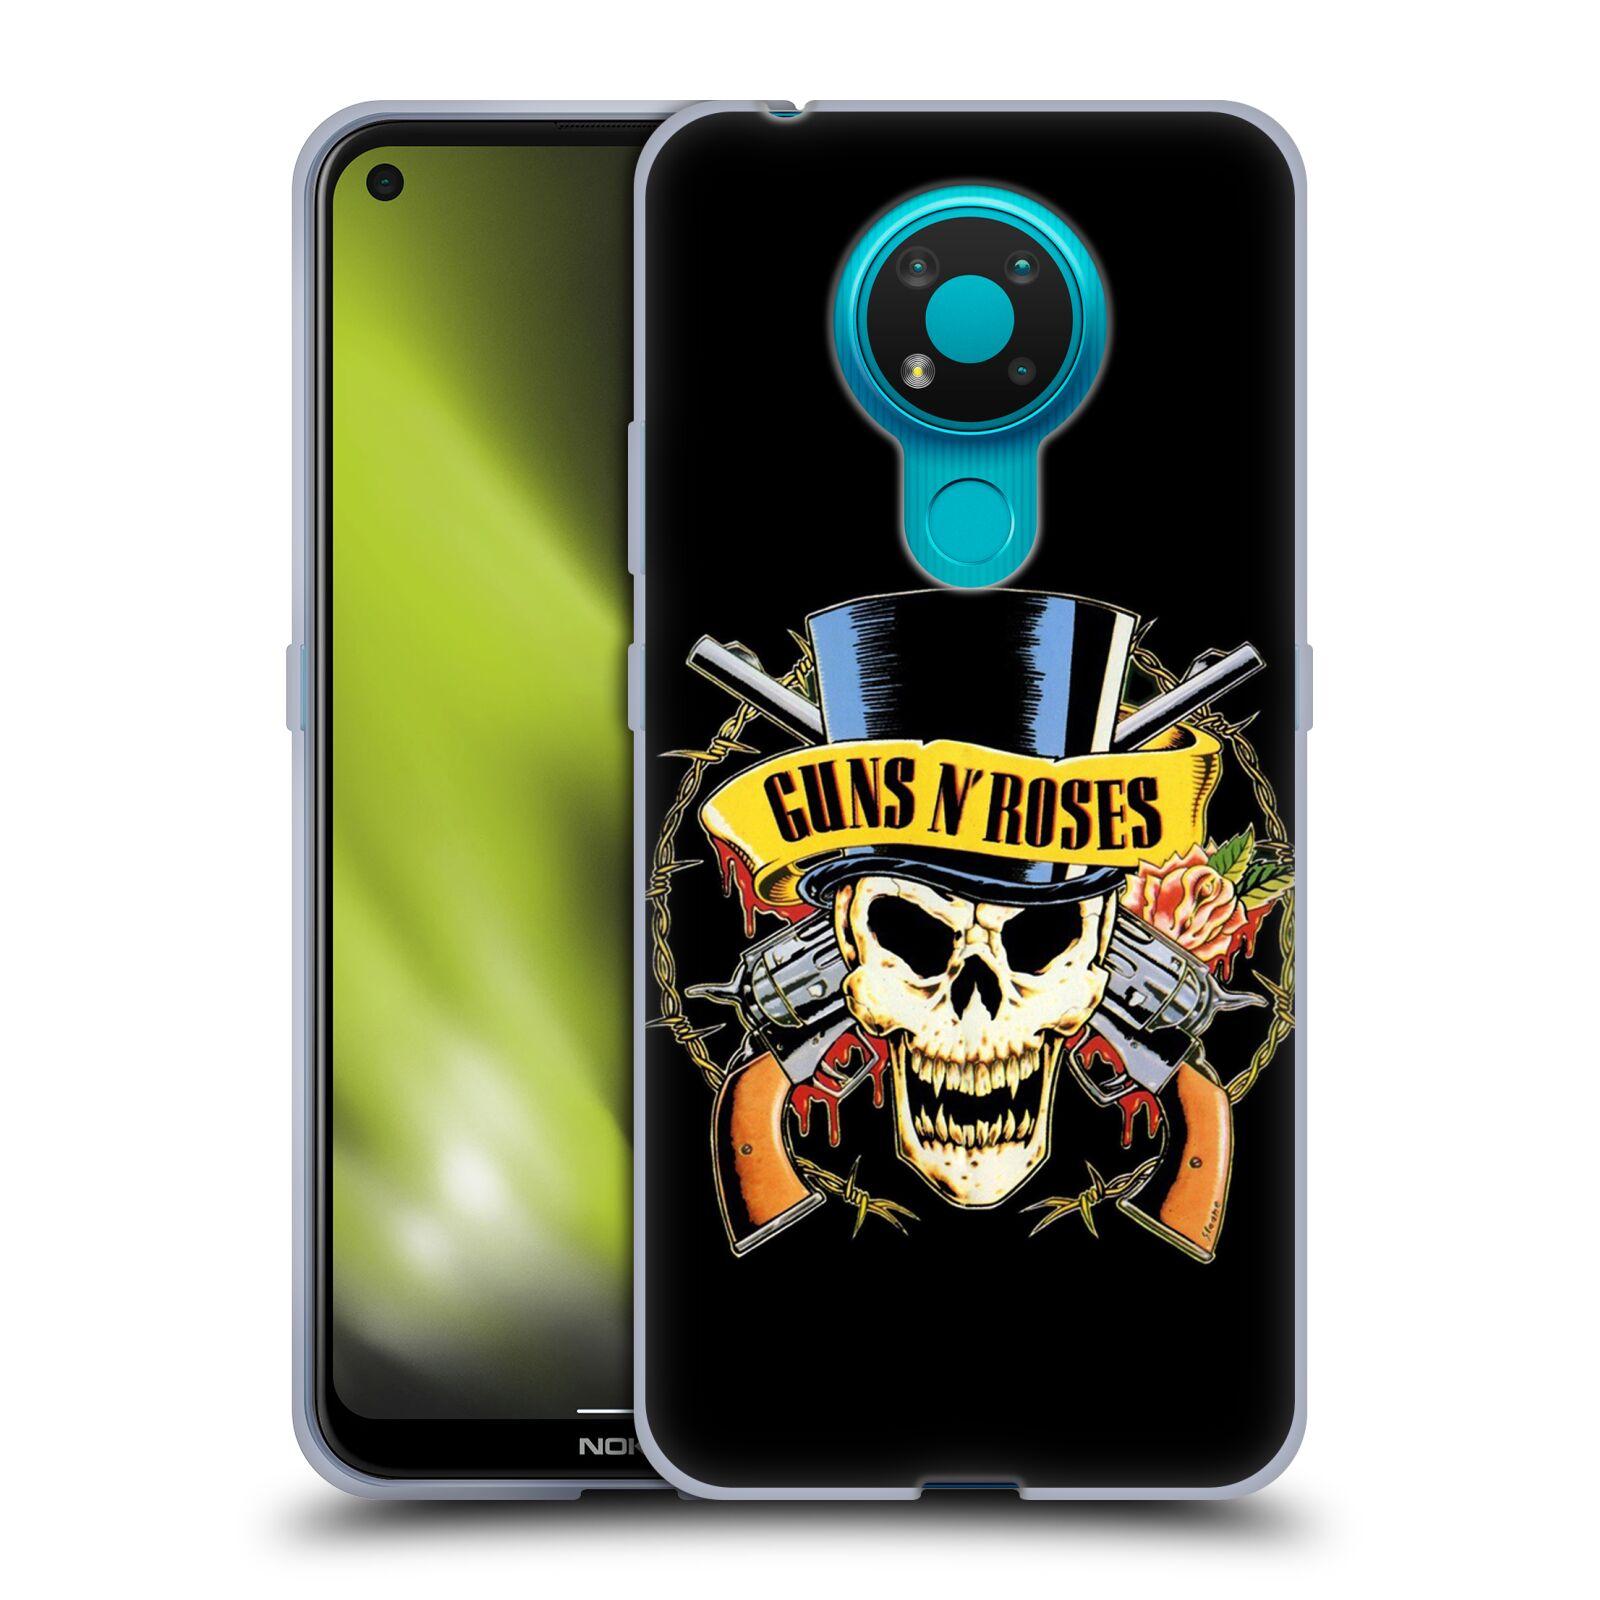 Silikonové pouzdro na mobil Nokia 3.4 - Head Case - Guns N' Roses - Lebka